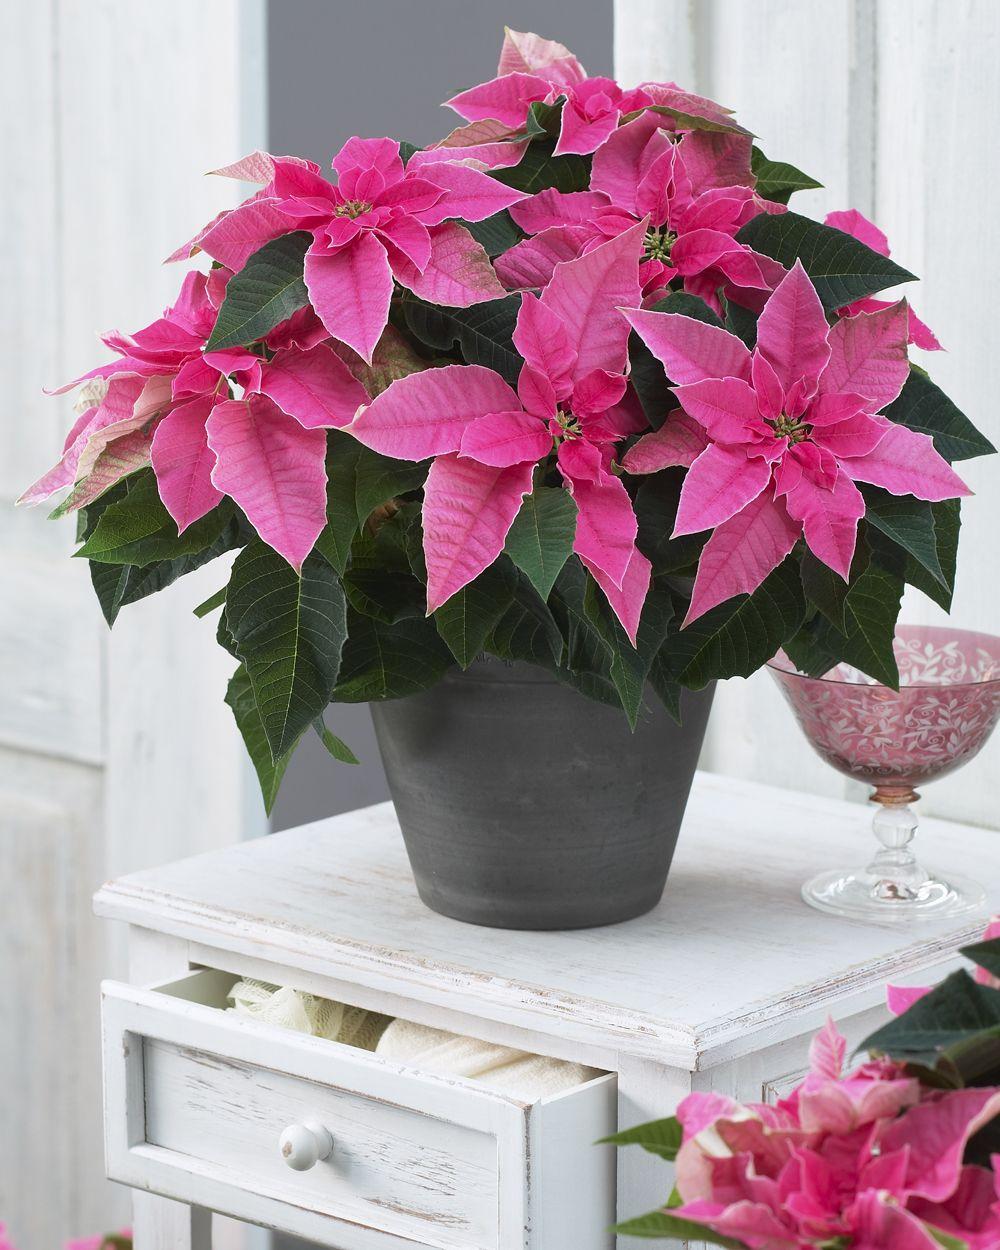 Princettia® Hot Pink Euphorbia Christmas plants, Pink